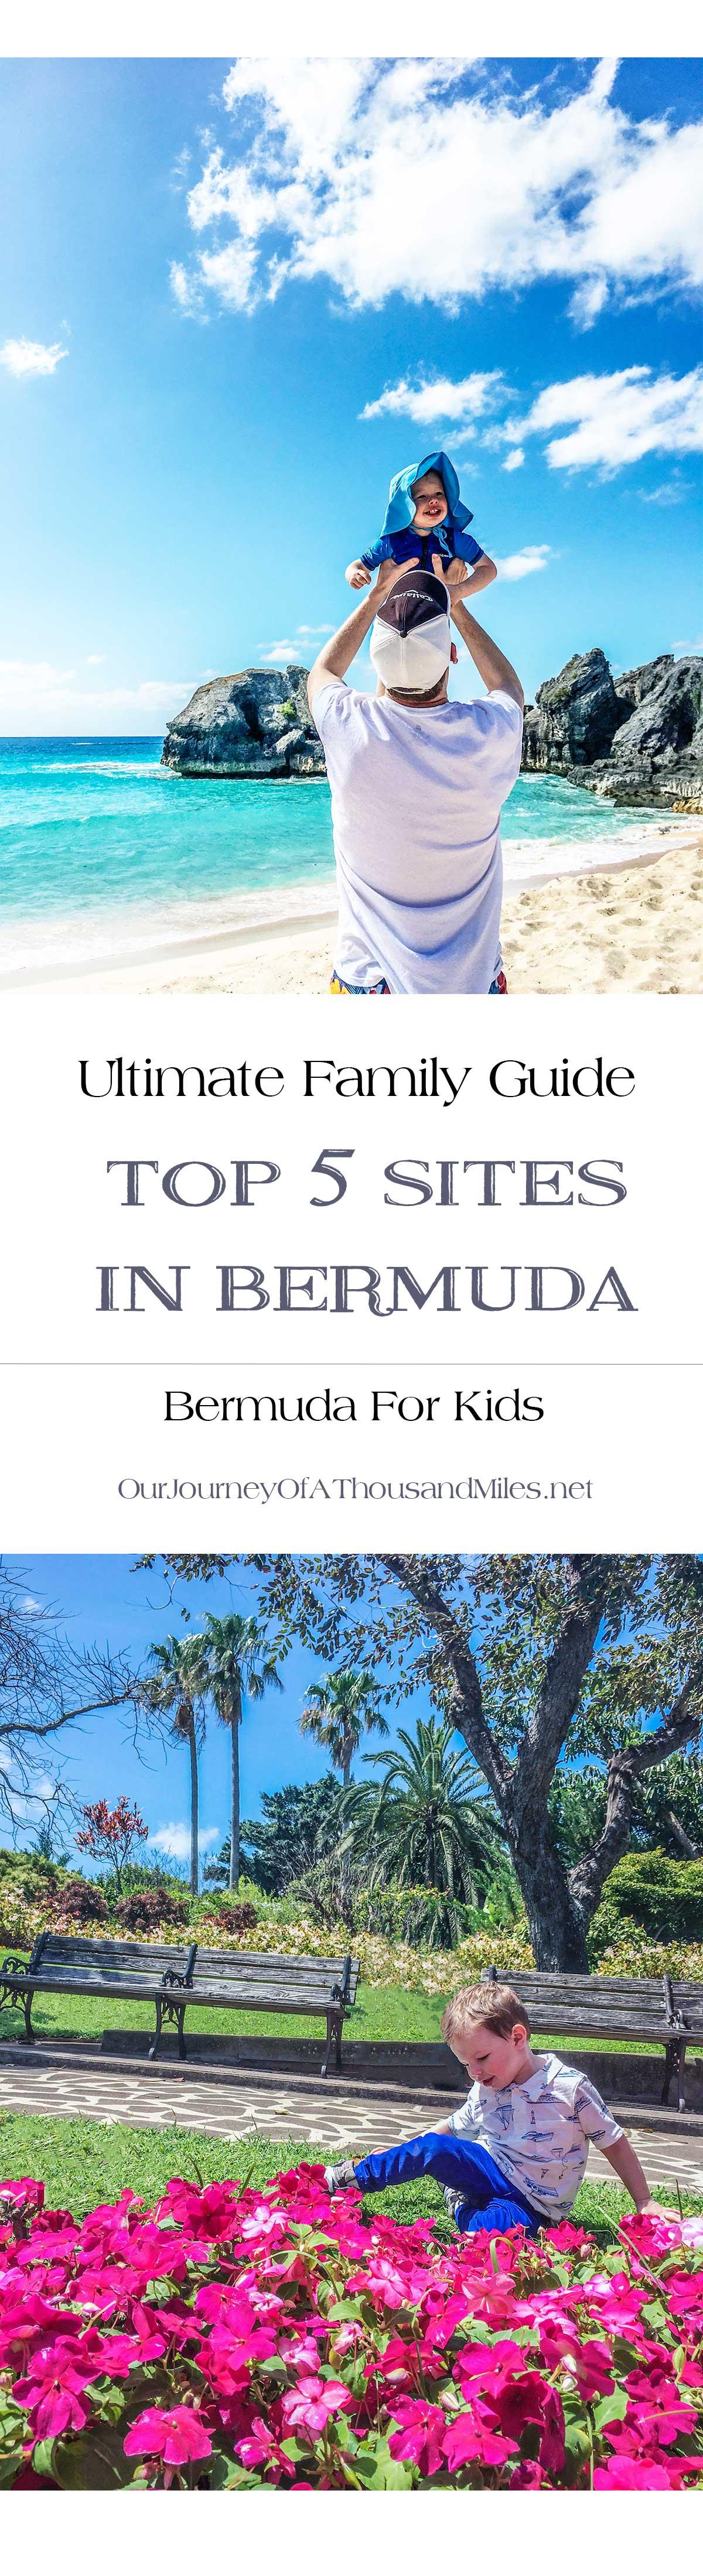 Ultimate-Family-Guide-Top-5-Sites-In-Bermuda-Bermuda-For-Kids